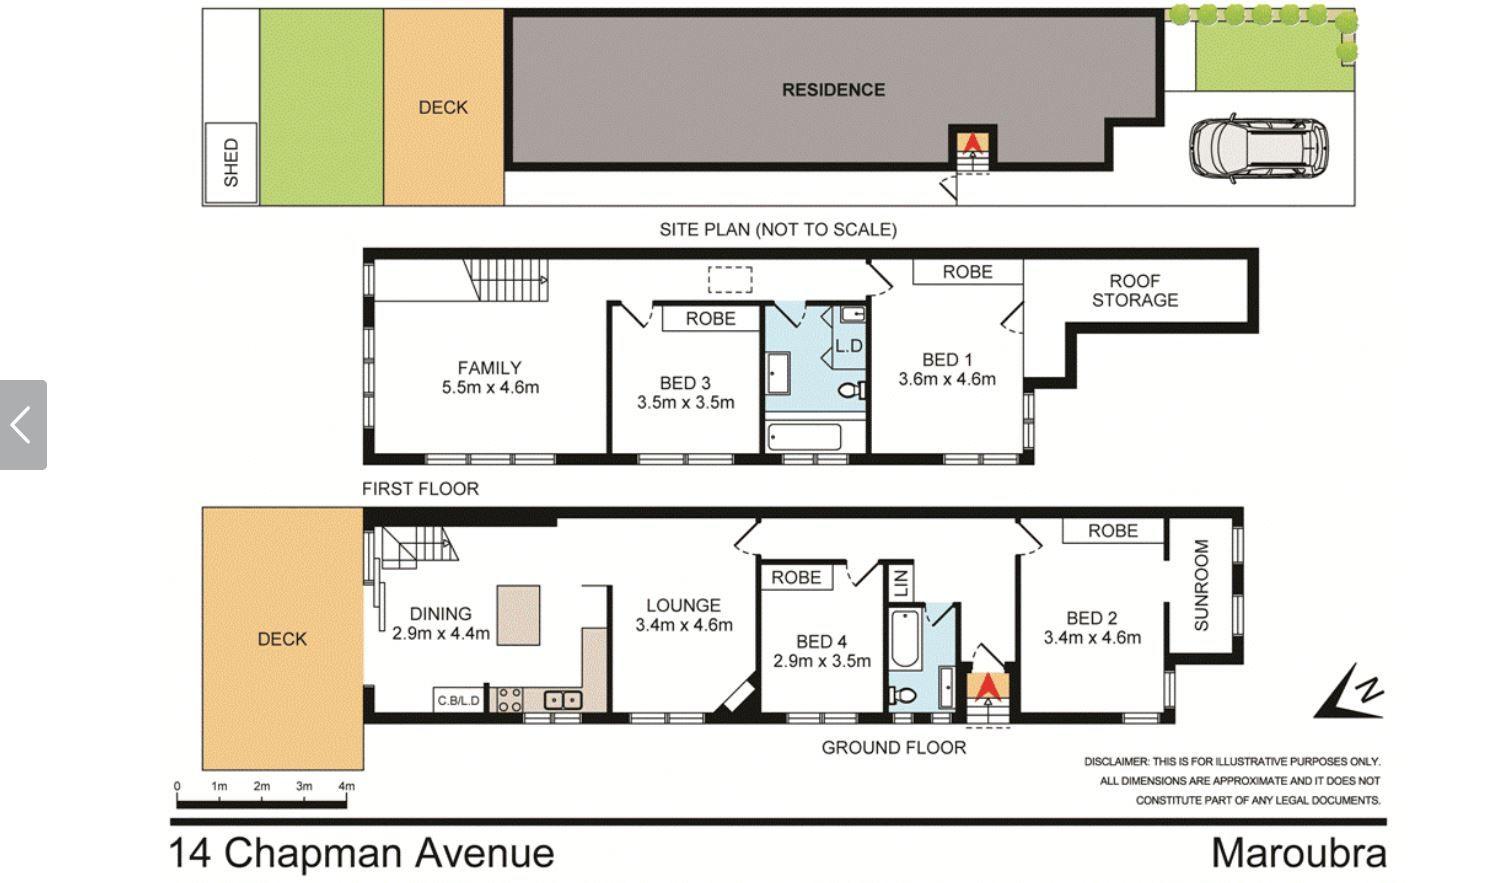 14 Chapman Avenue Maroubra 2035